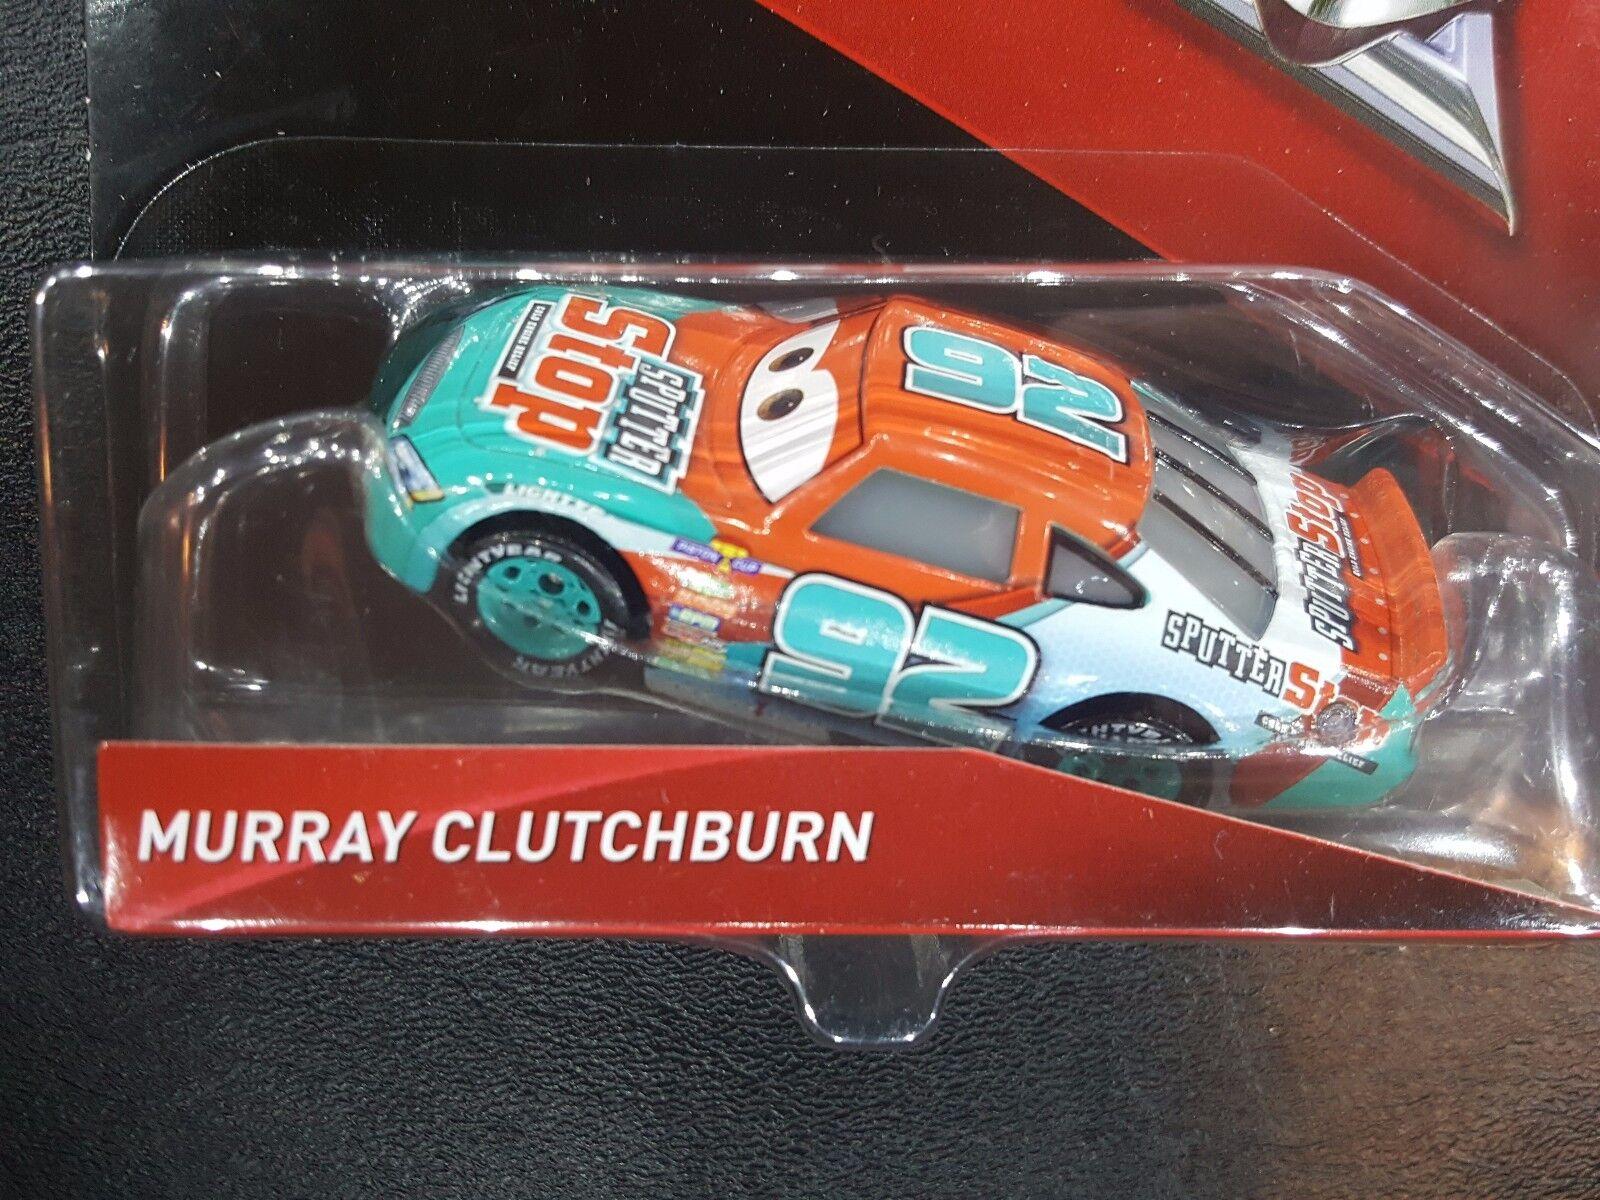 Disney Pixar Cars MINI RACER MURRAY CLUTCHBURN SPUTTER STOP MATTEL Diecast